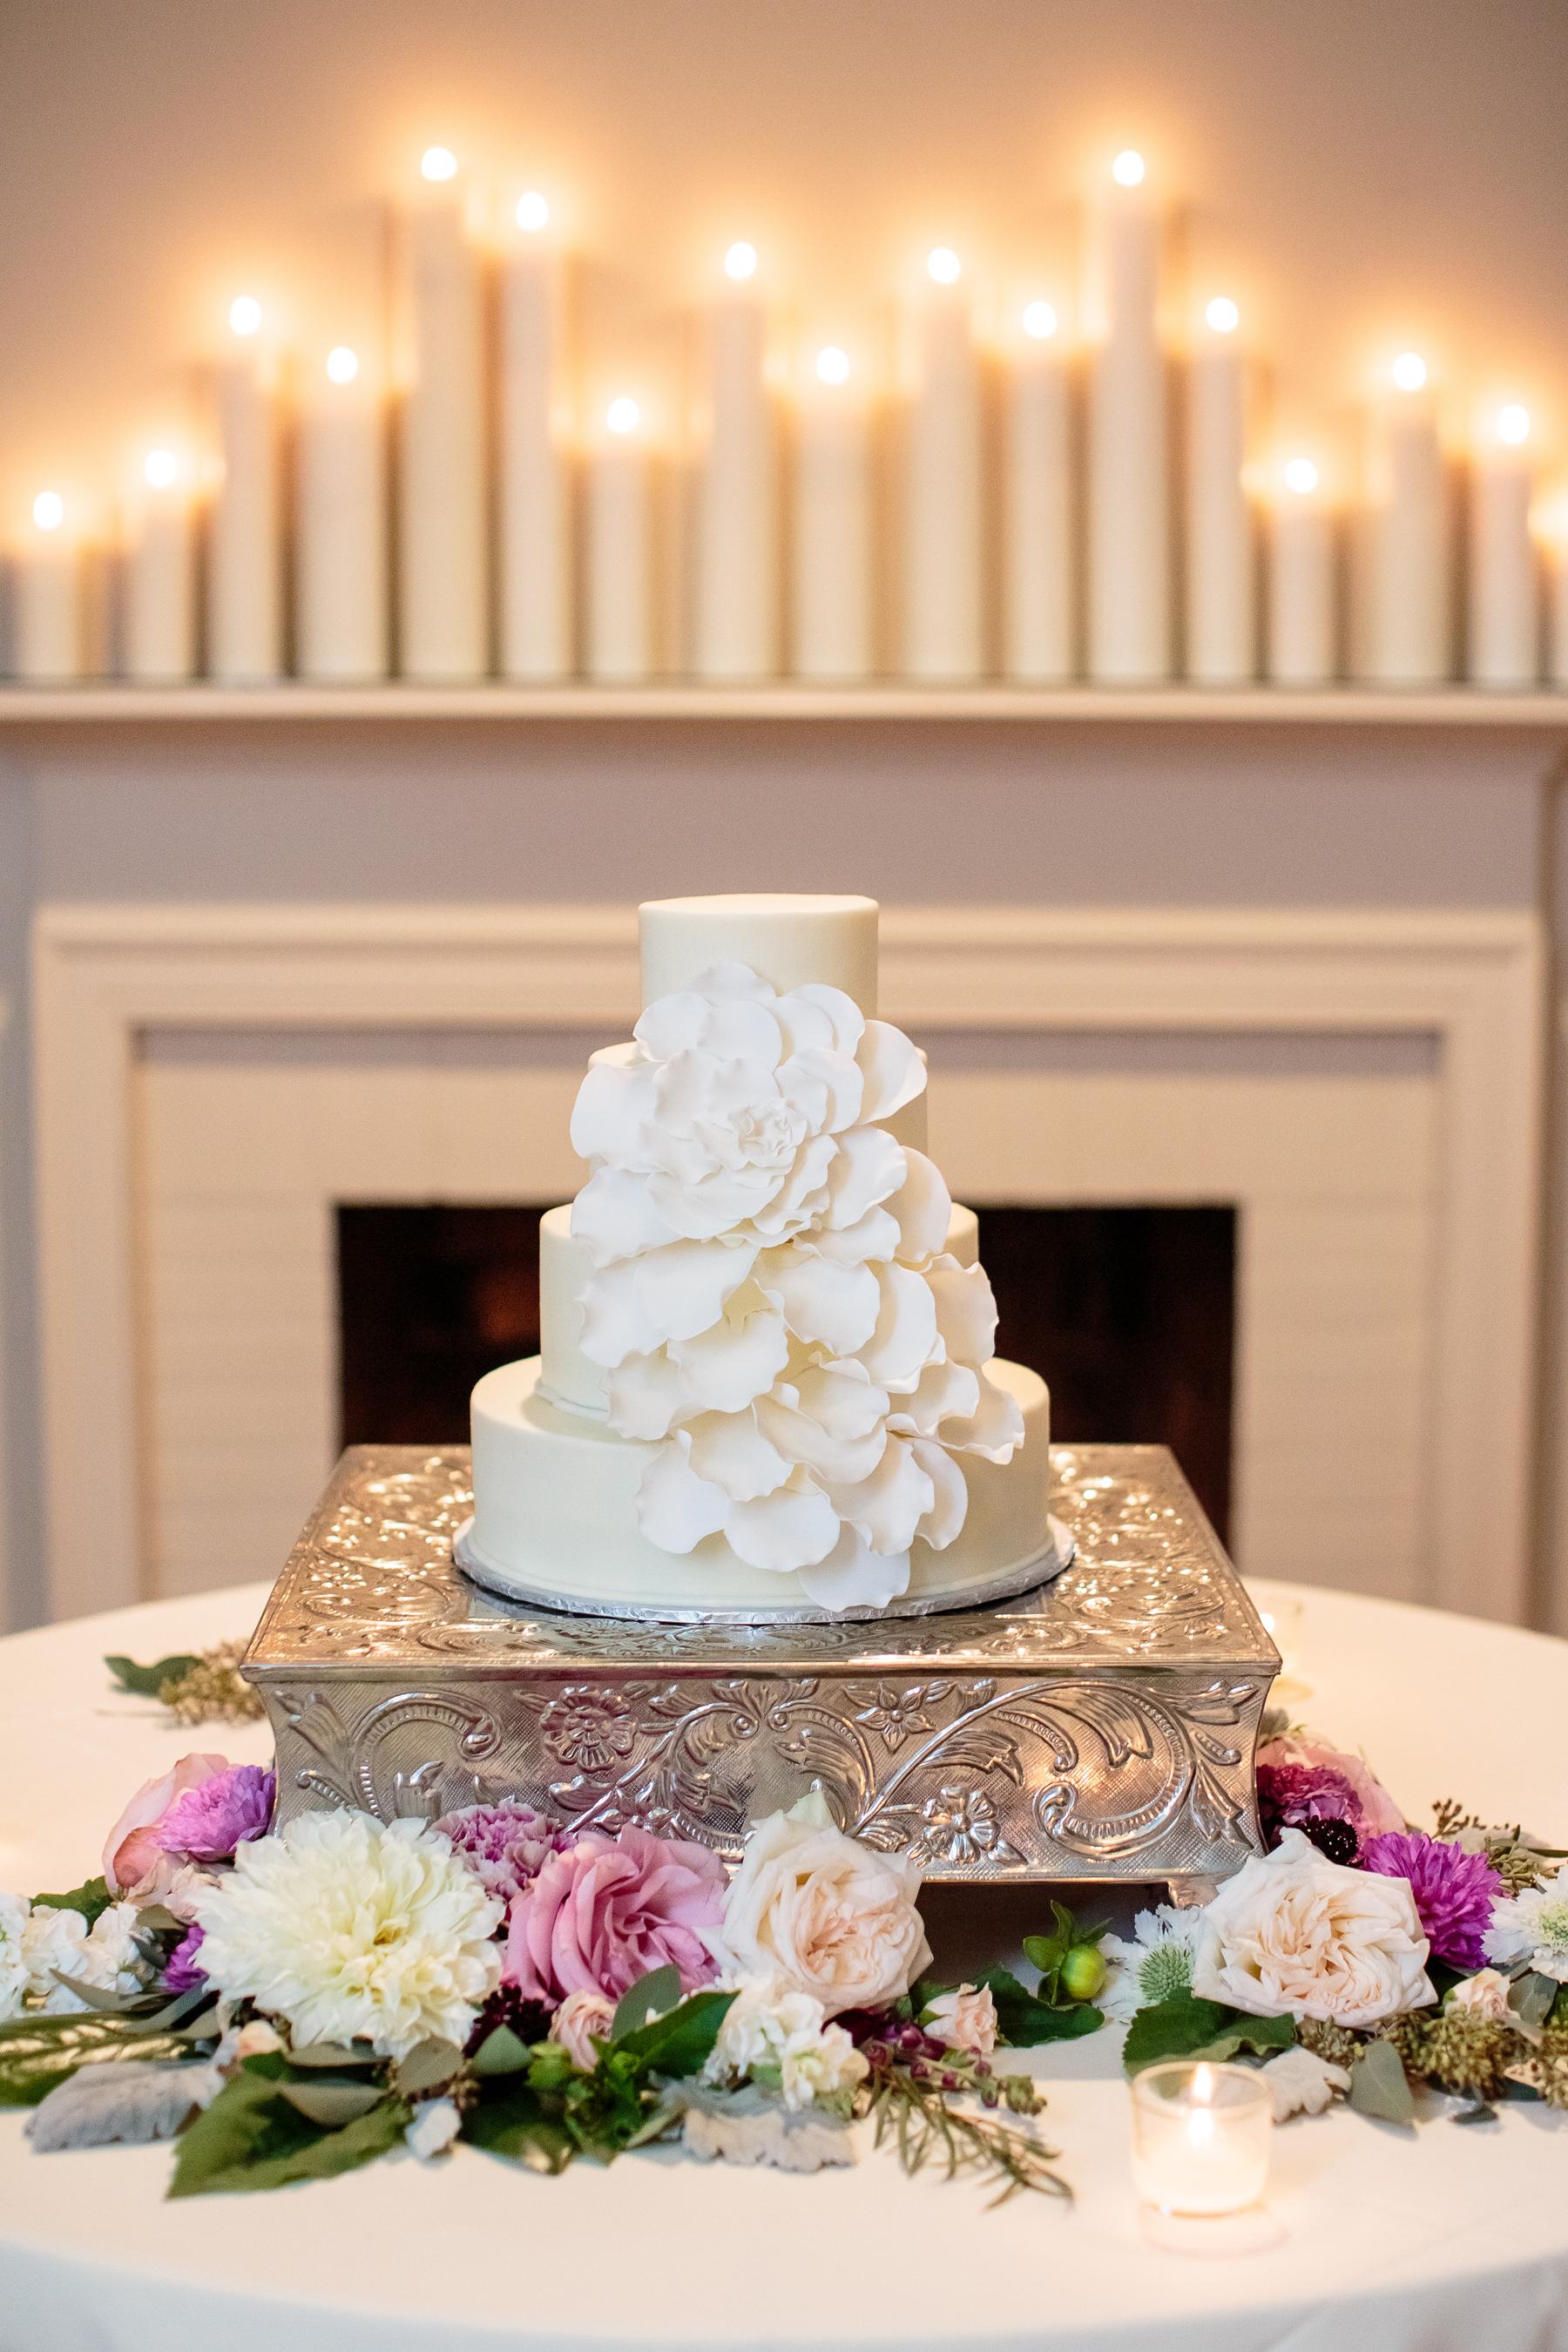 Wedding Cake with Large Sugar Petals